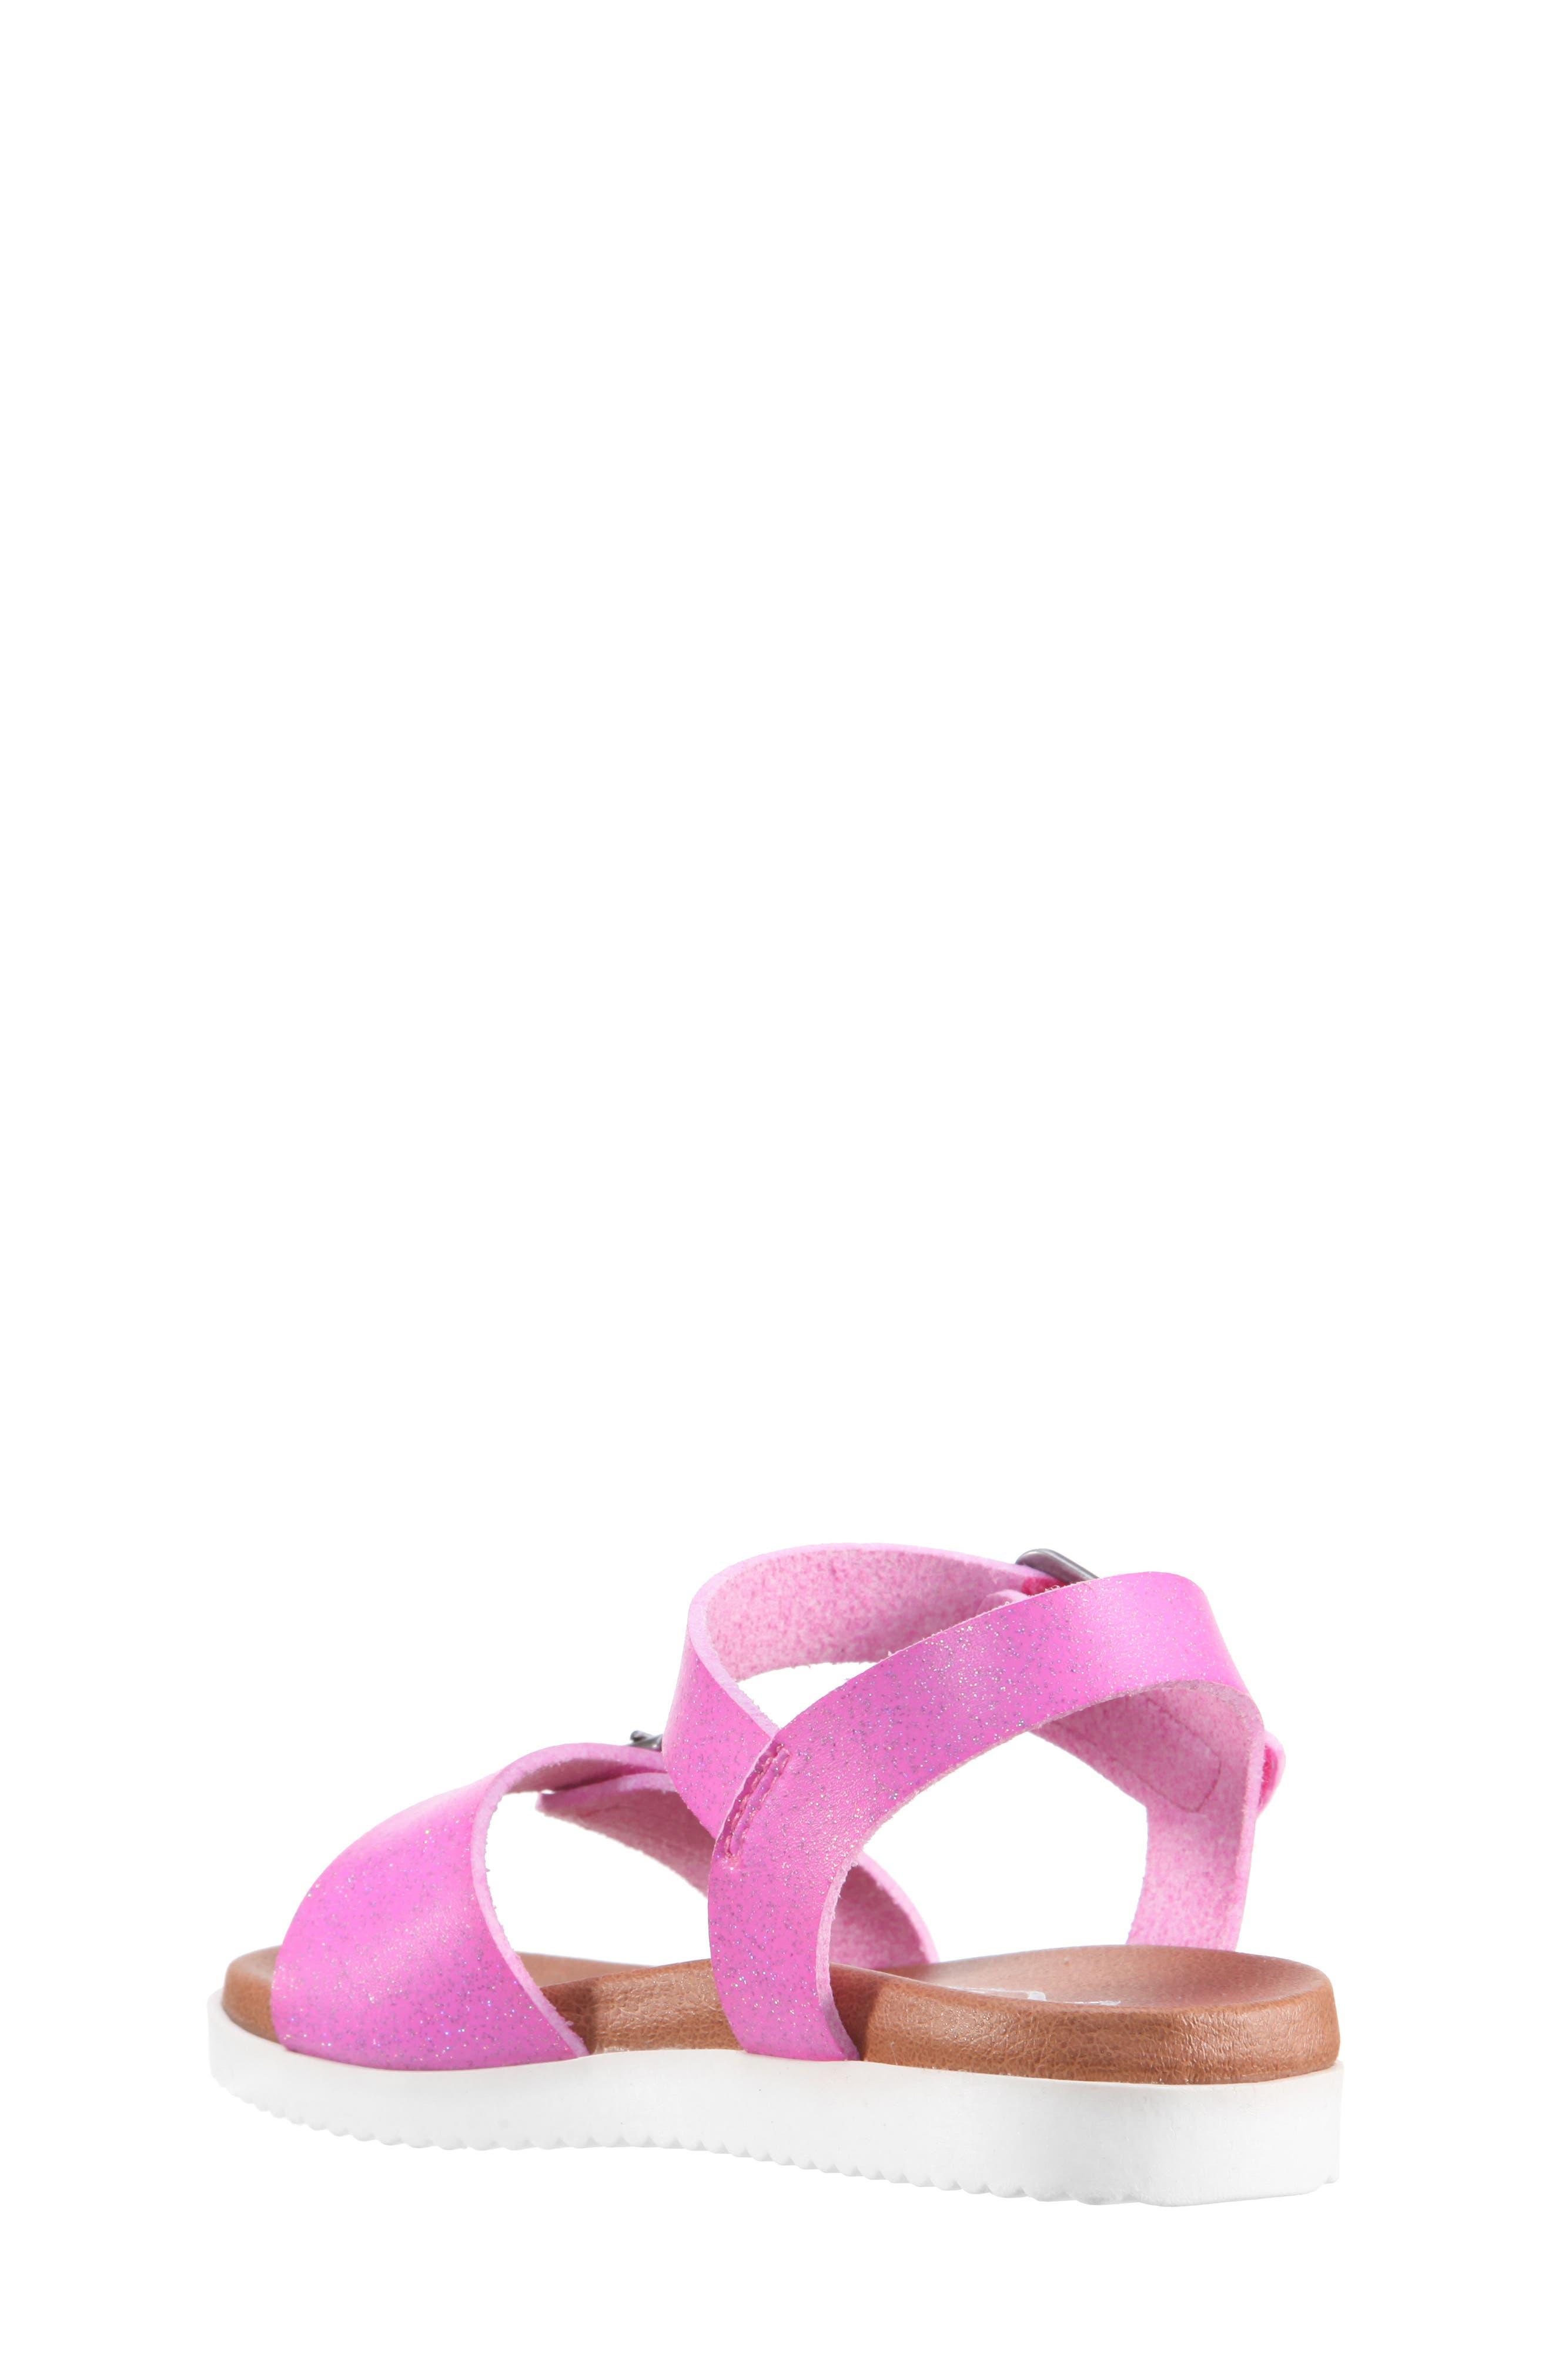 Jacklin3 Quarter Strap Sandal,                             Alternate thumbnail 2, color,                             Pink Dip Dye